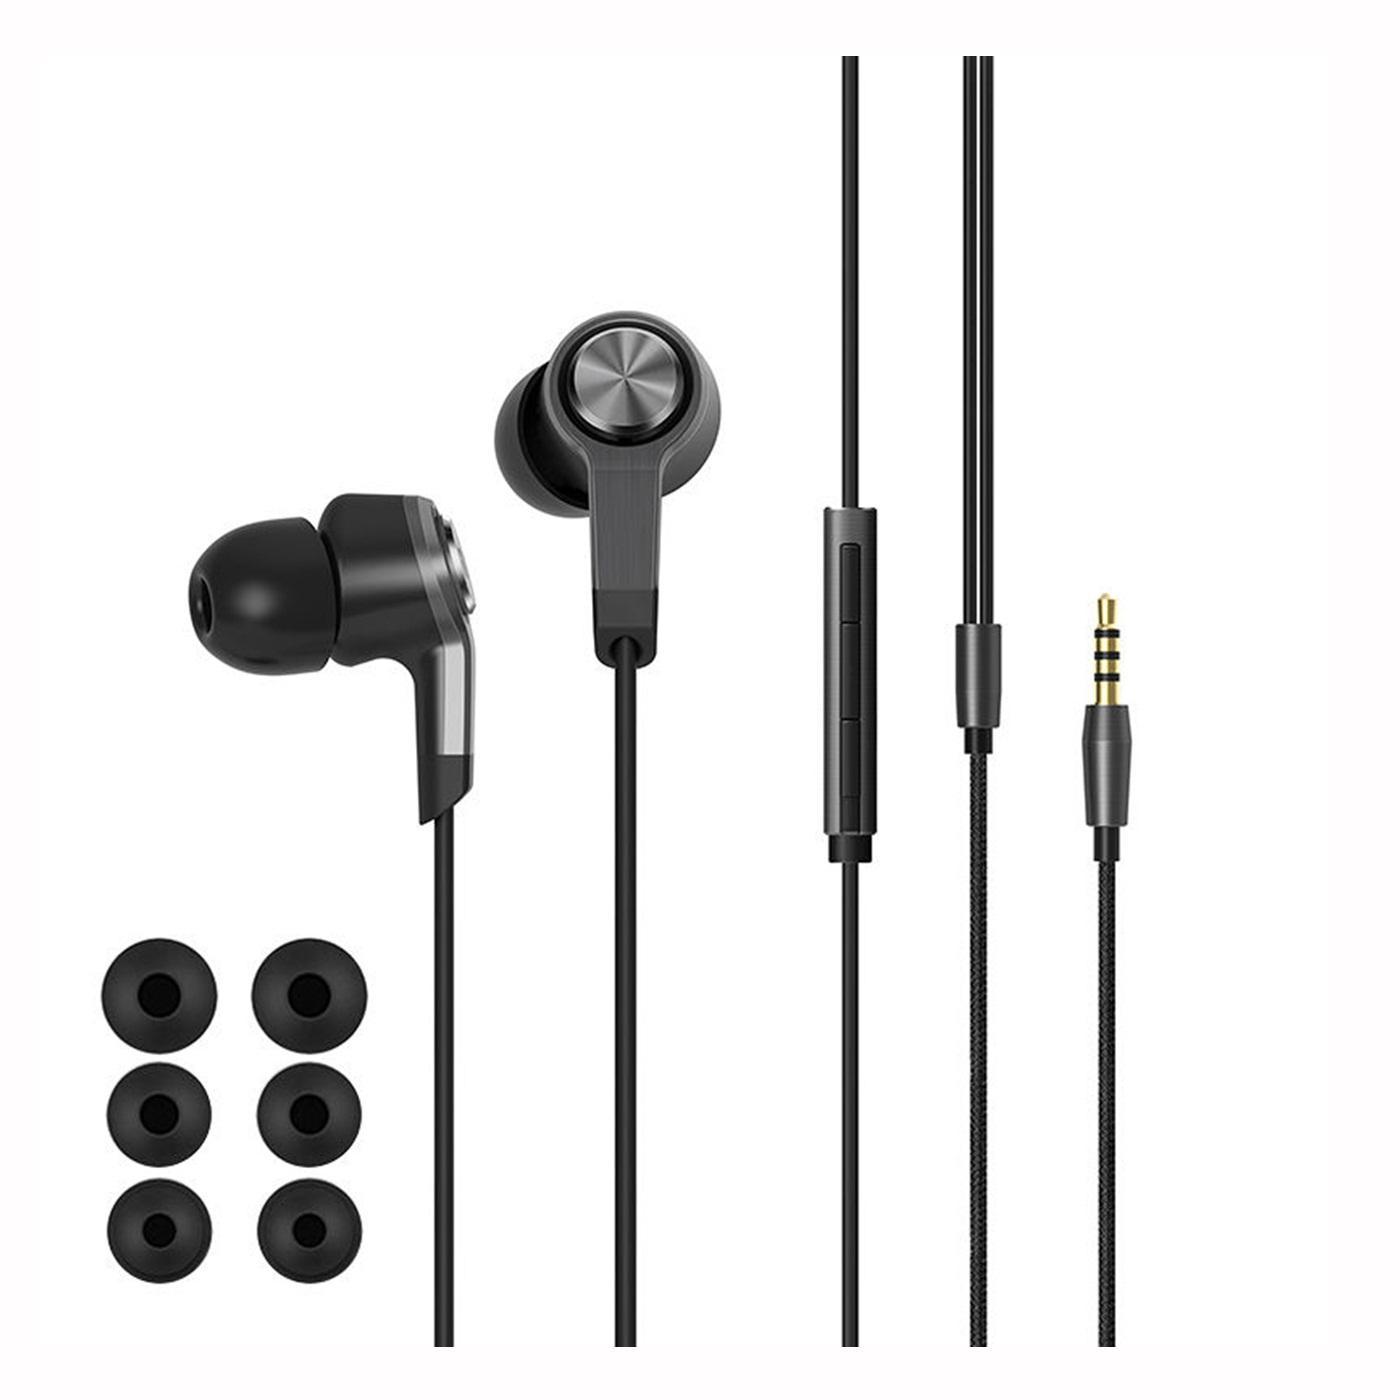 Fitur Xiaomi Headset Hanfree Headphones Piston 3rd Black Generation 3 Colorful Edition Earphone Original Hitam 4